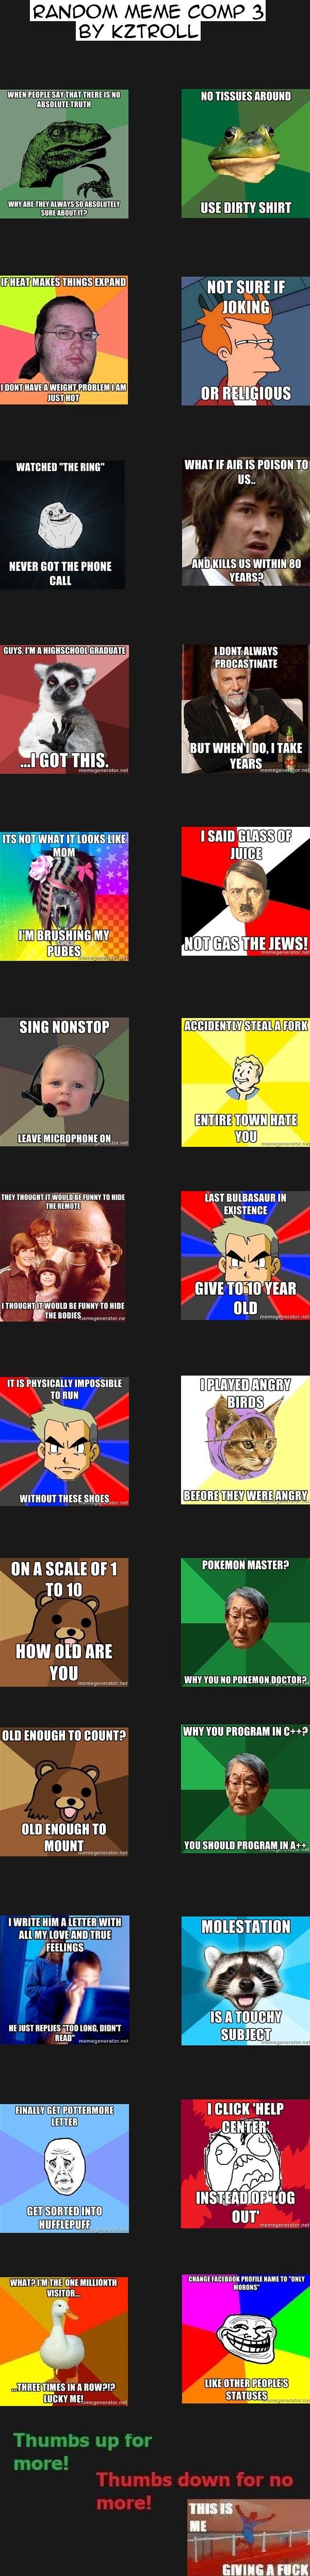 "Random Meme Comp 3. Thumbs and Subscribe for moar comps!!. FANDOM MEME COMP 3 BY KZTROLL WHEN ""ITU Mt ' IS IN mu um um IRWINS "" _ mun sun: nanny It WE NINE"" MIM"